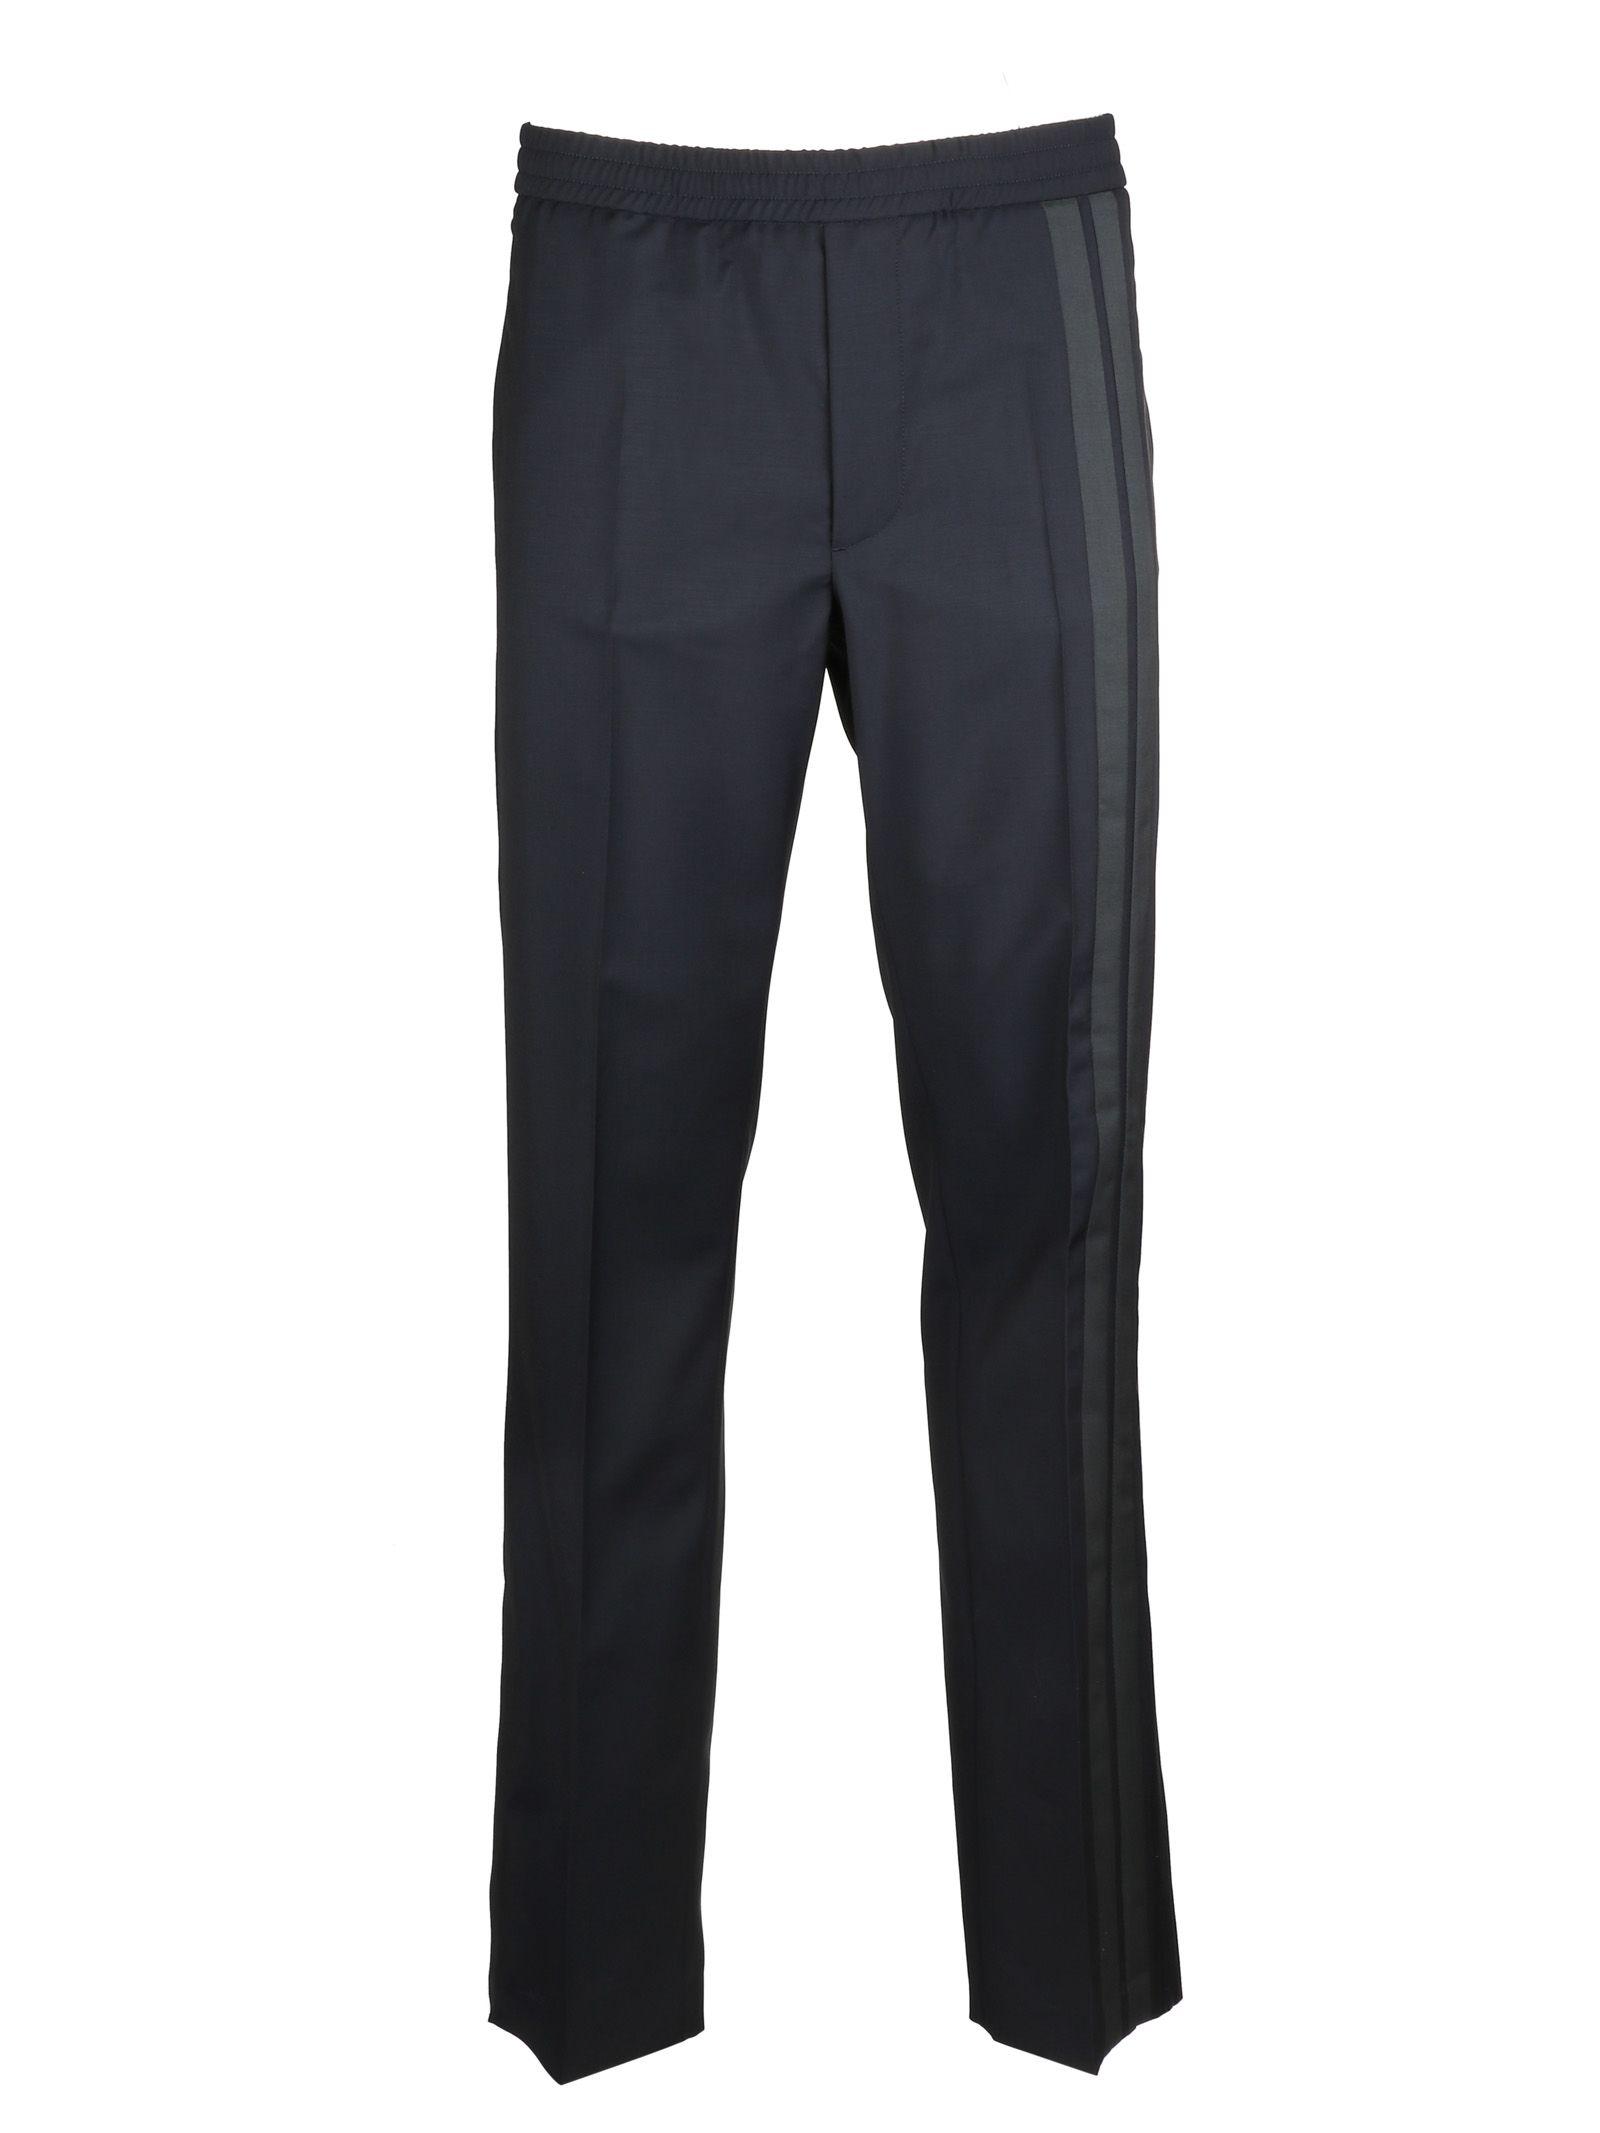 VALENTINO STRIPED TRACK PANTS